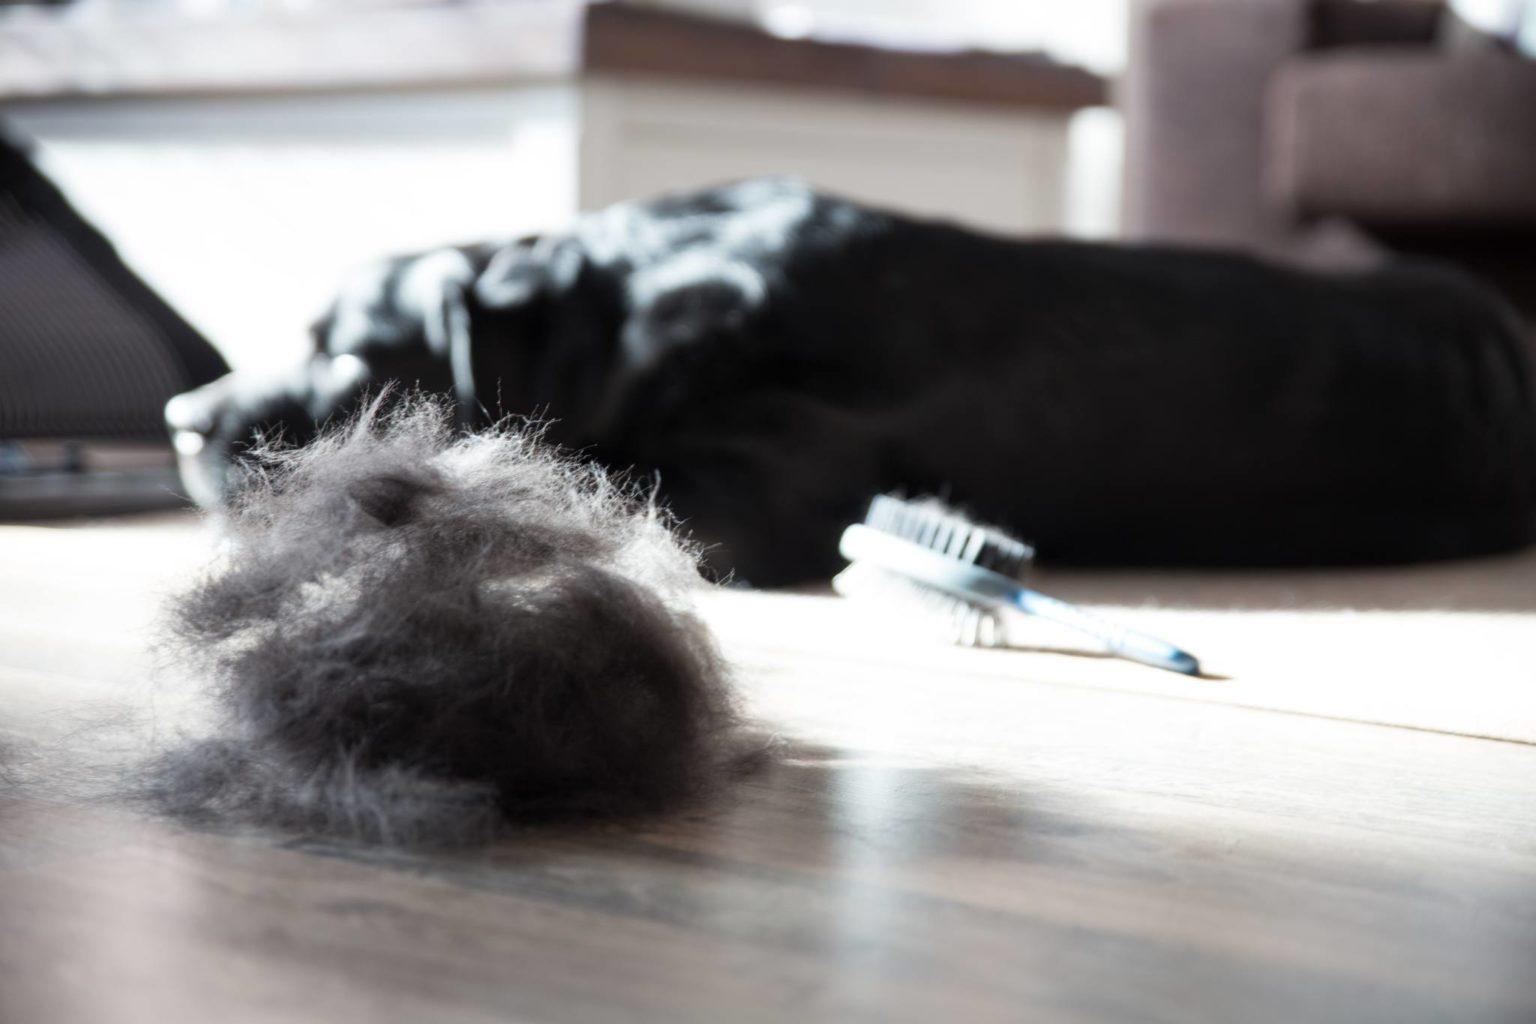 clean, pet-friendly home